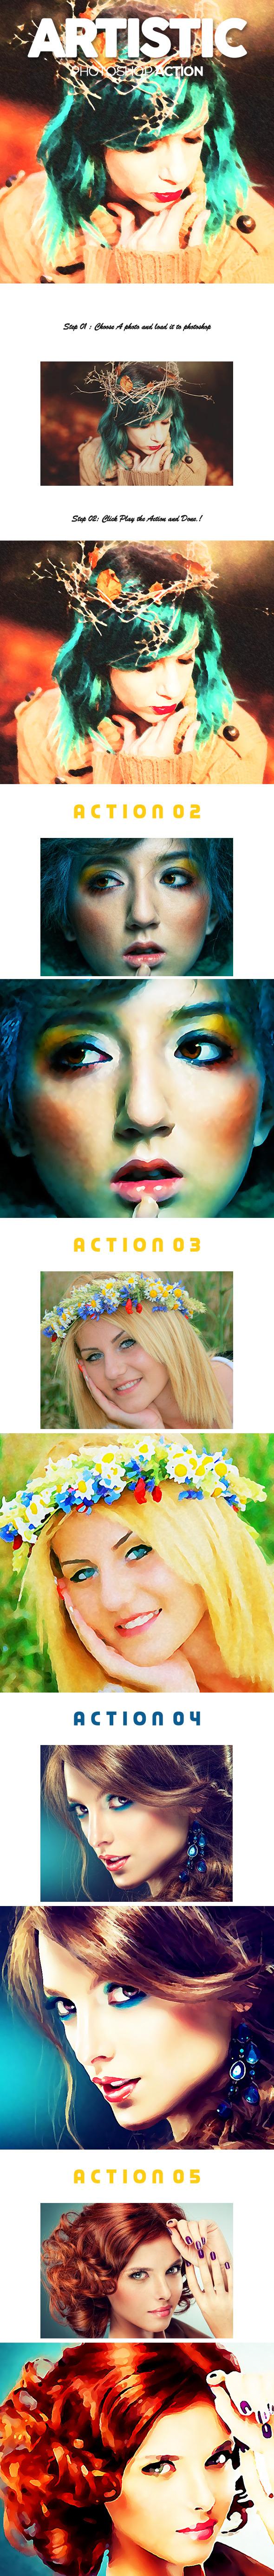 Artistic Photoshop Action